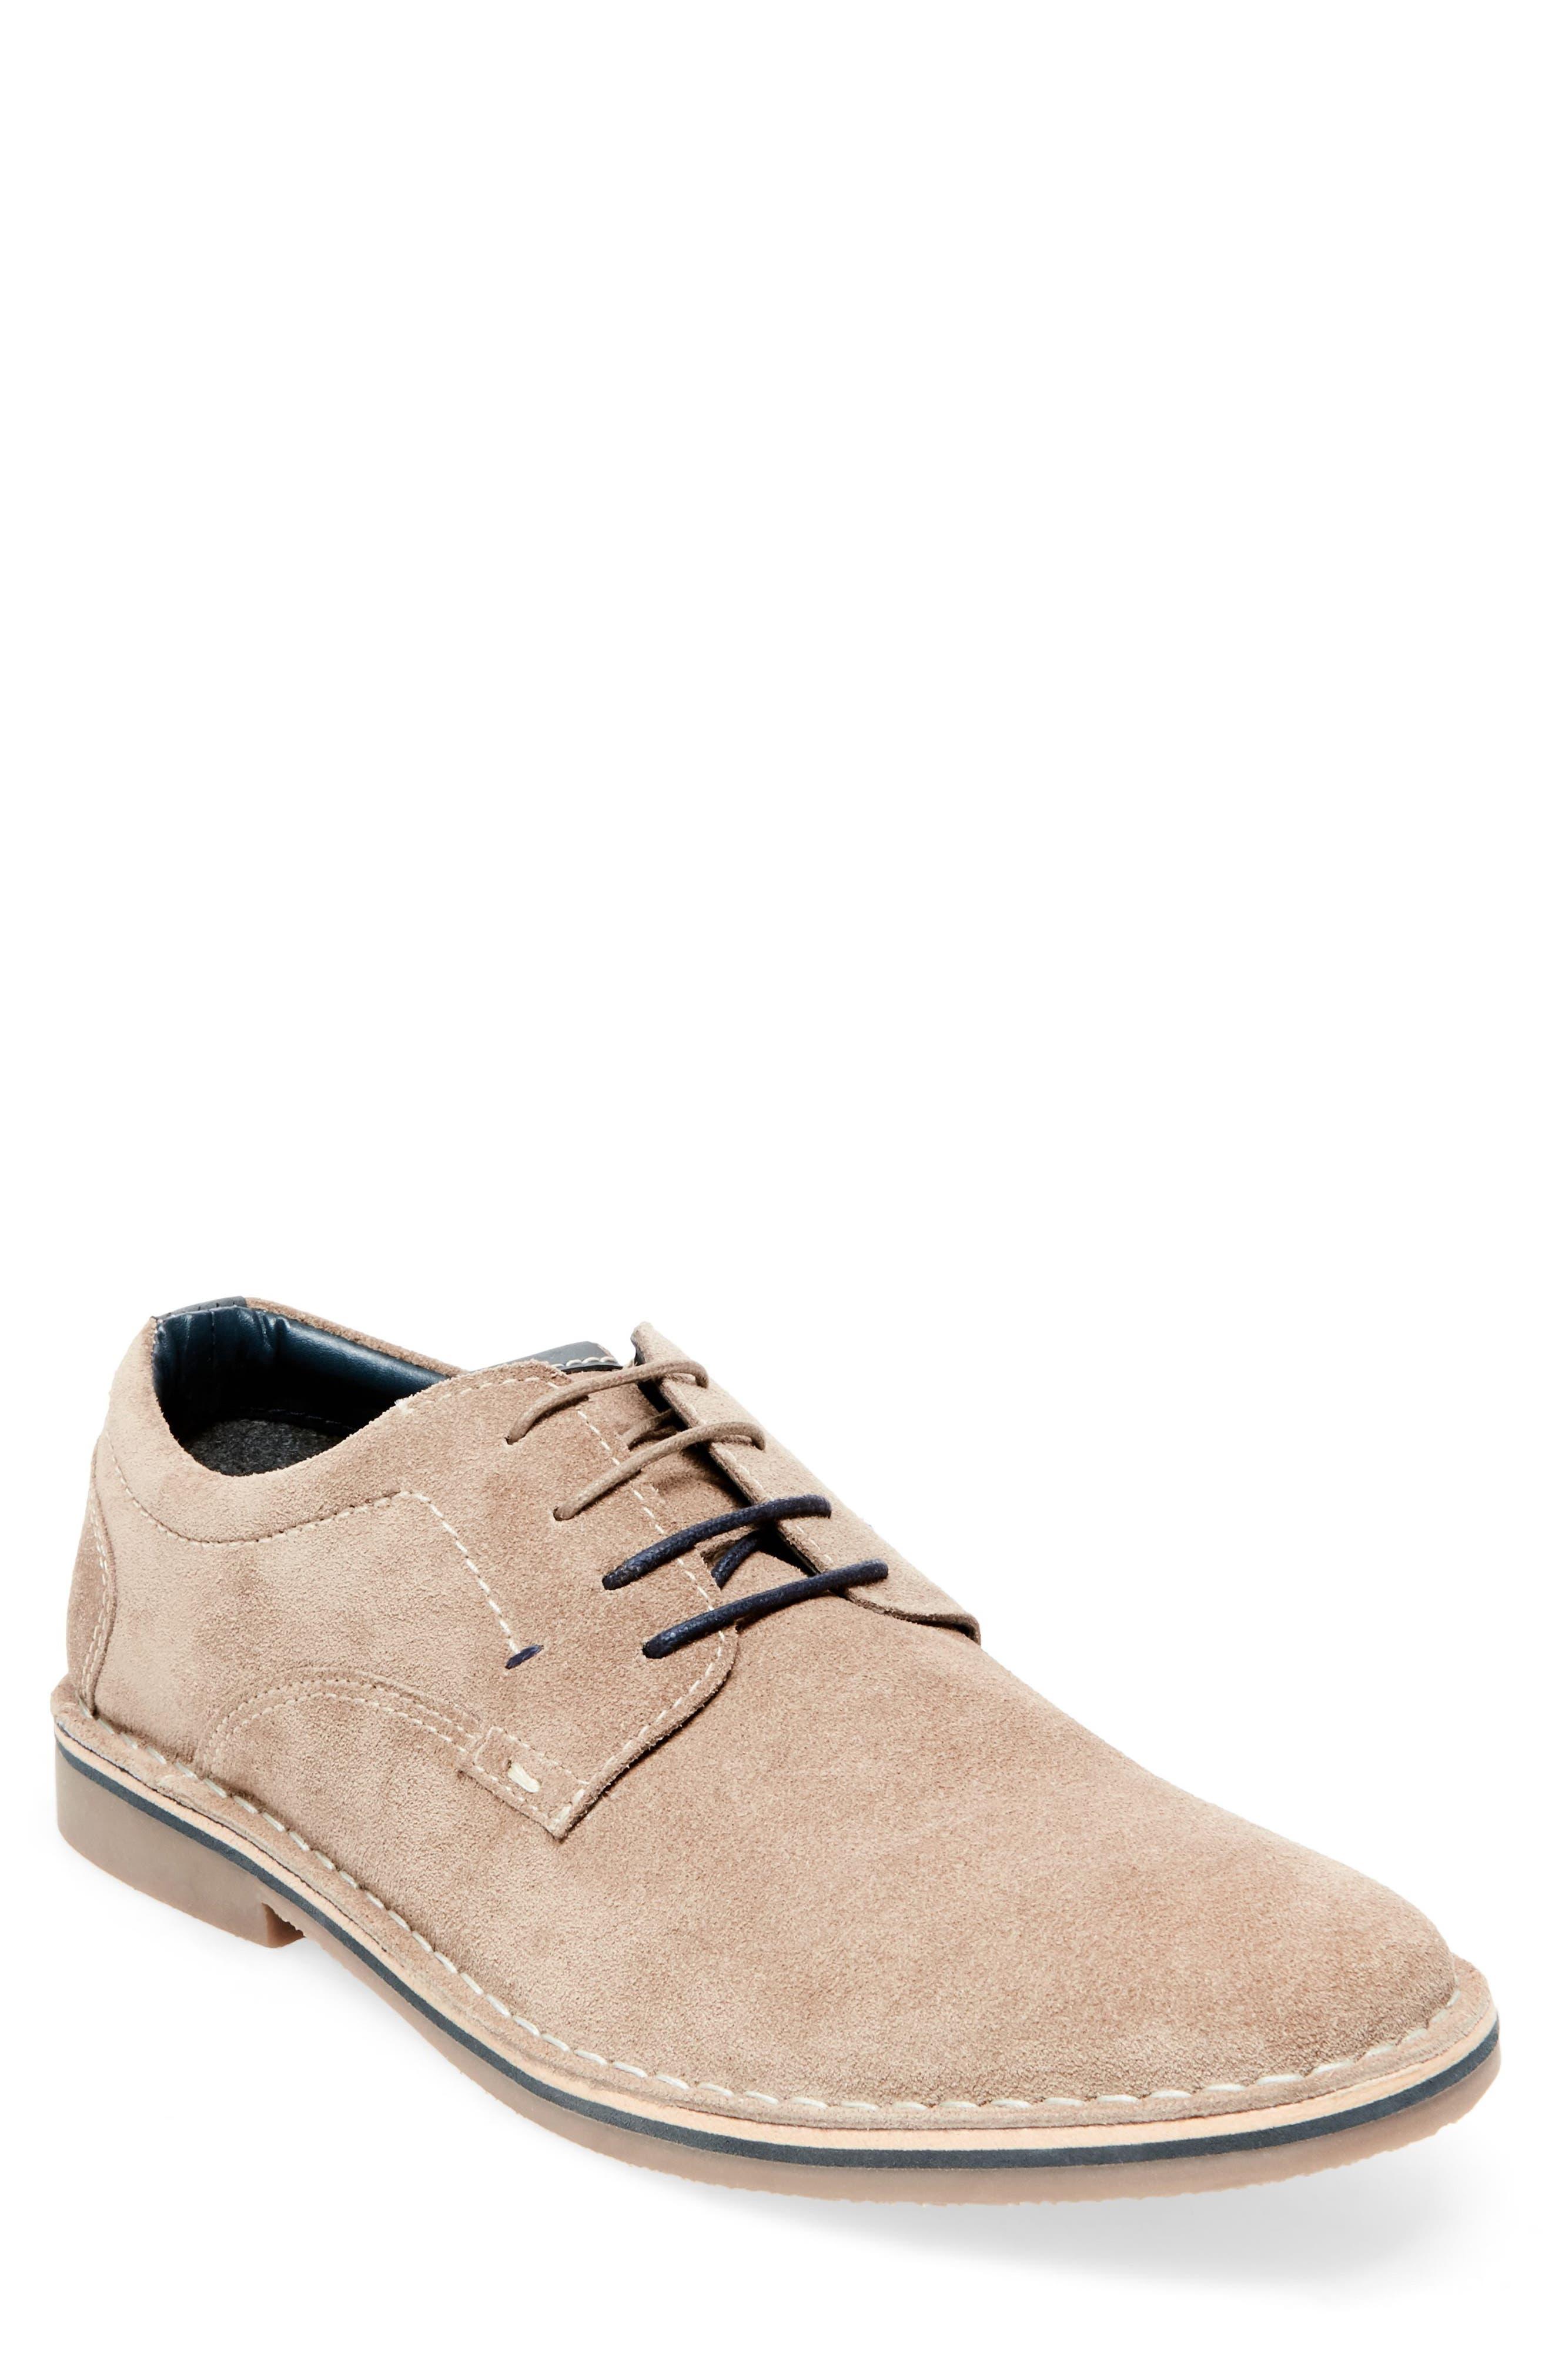 Hatrick Buck Shoe,                         Main,                         color, Taupe Suede